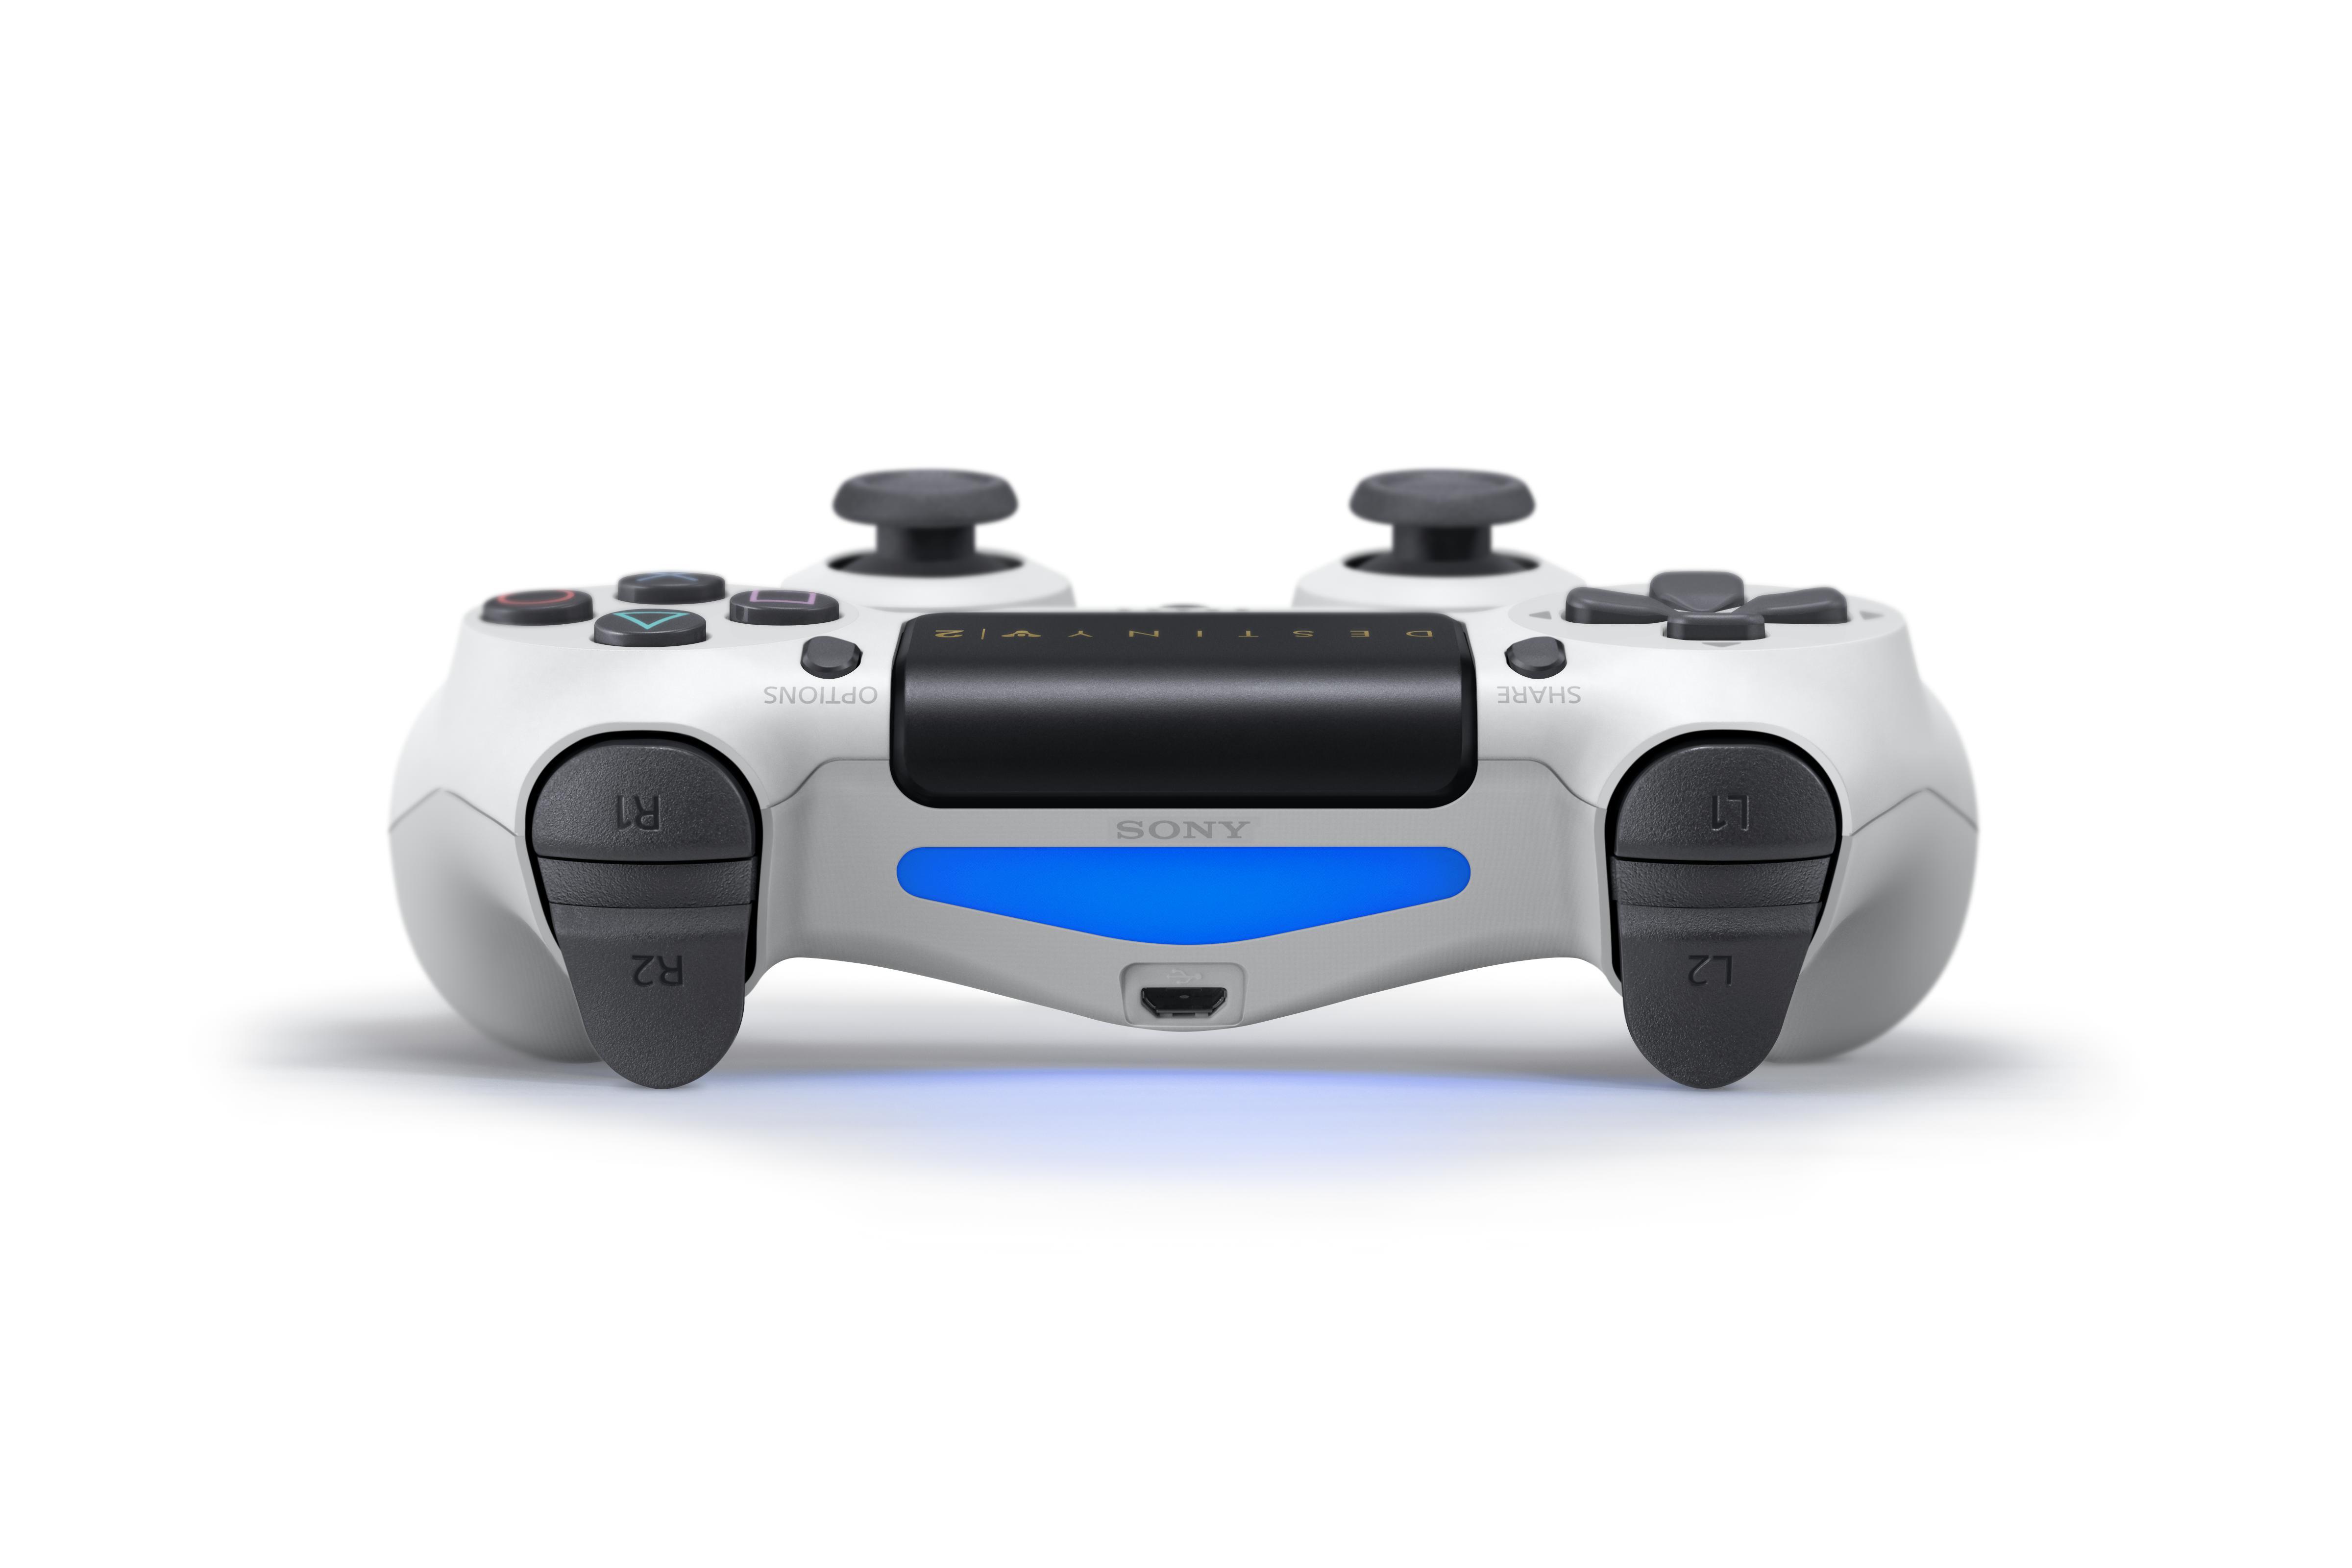 Destiny 2 DualShock 4